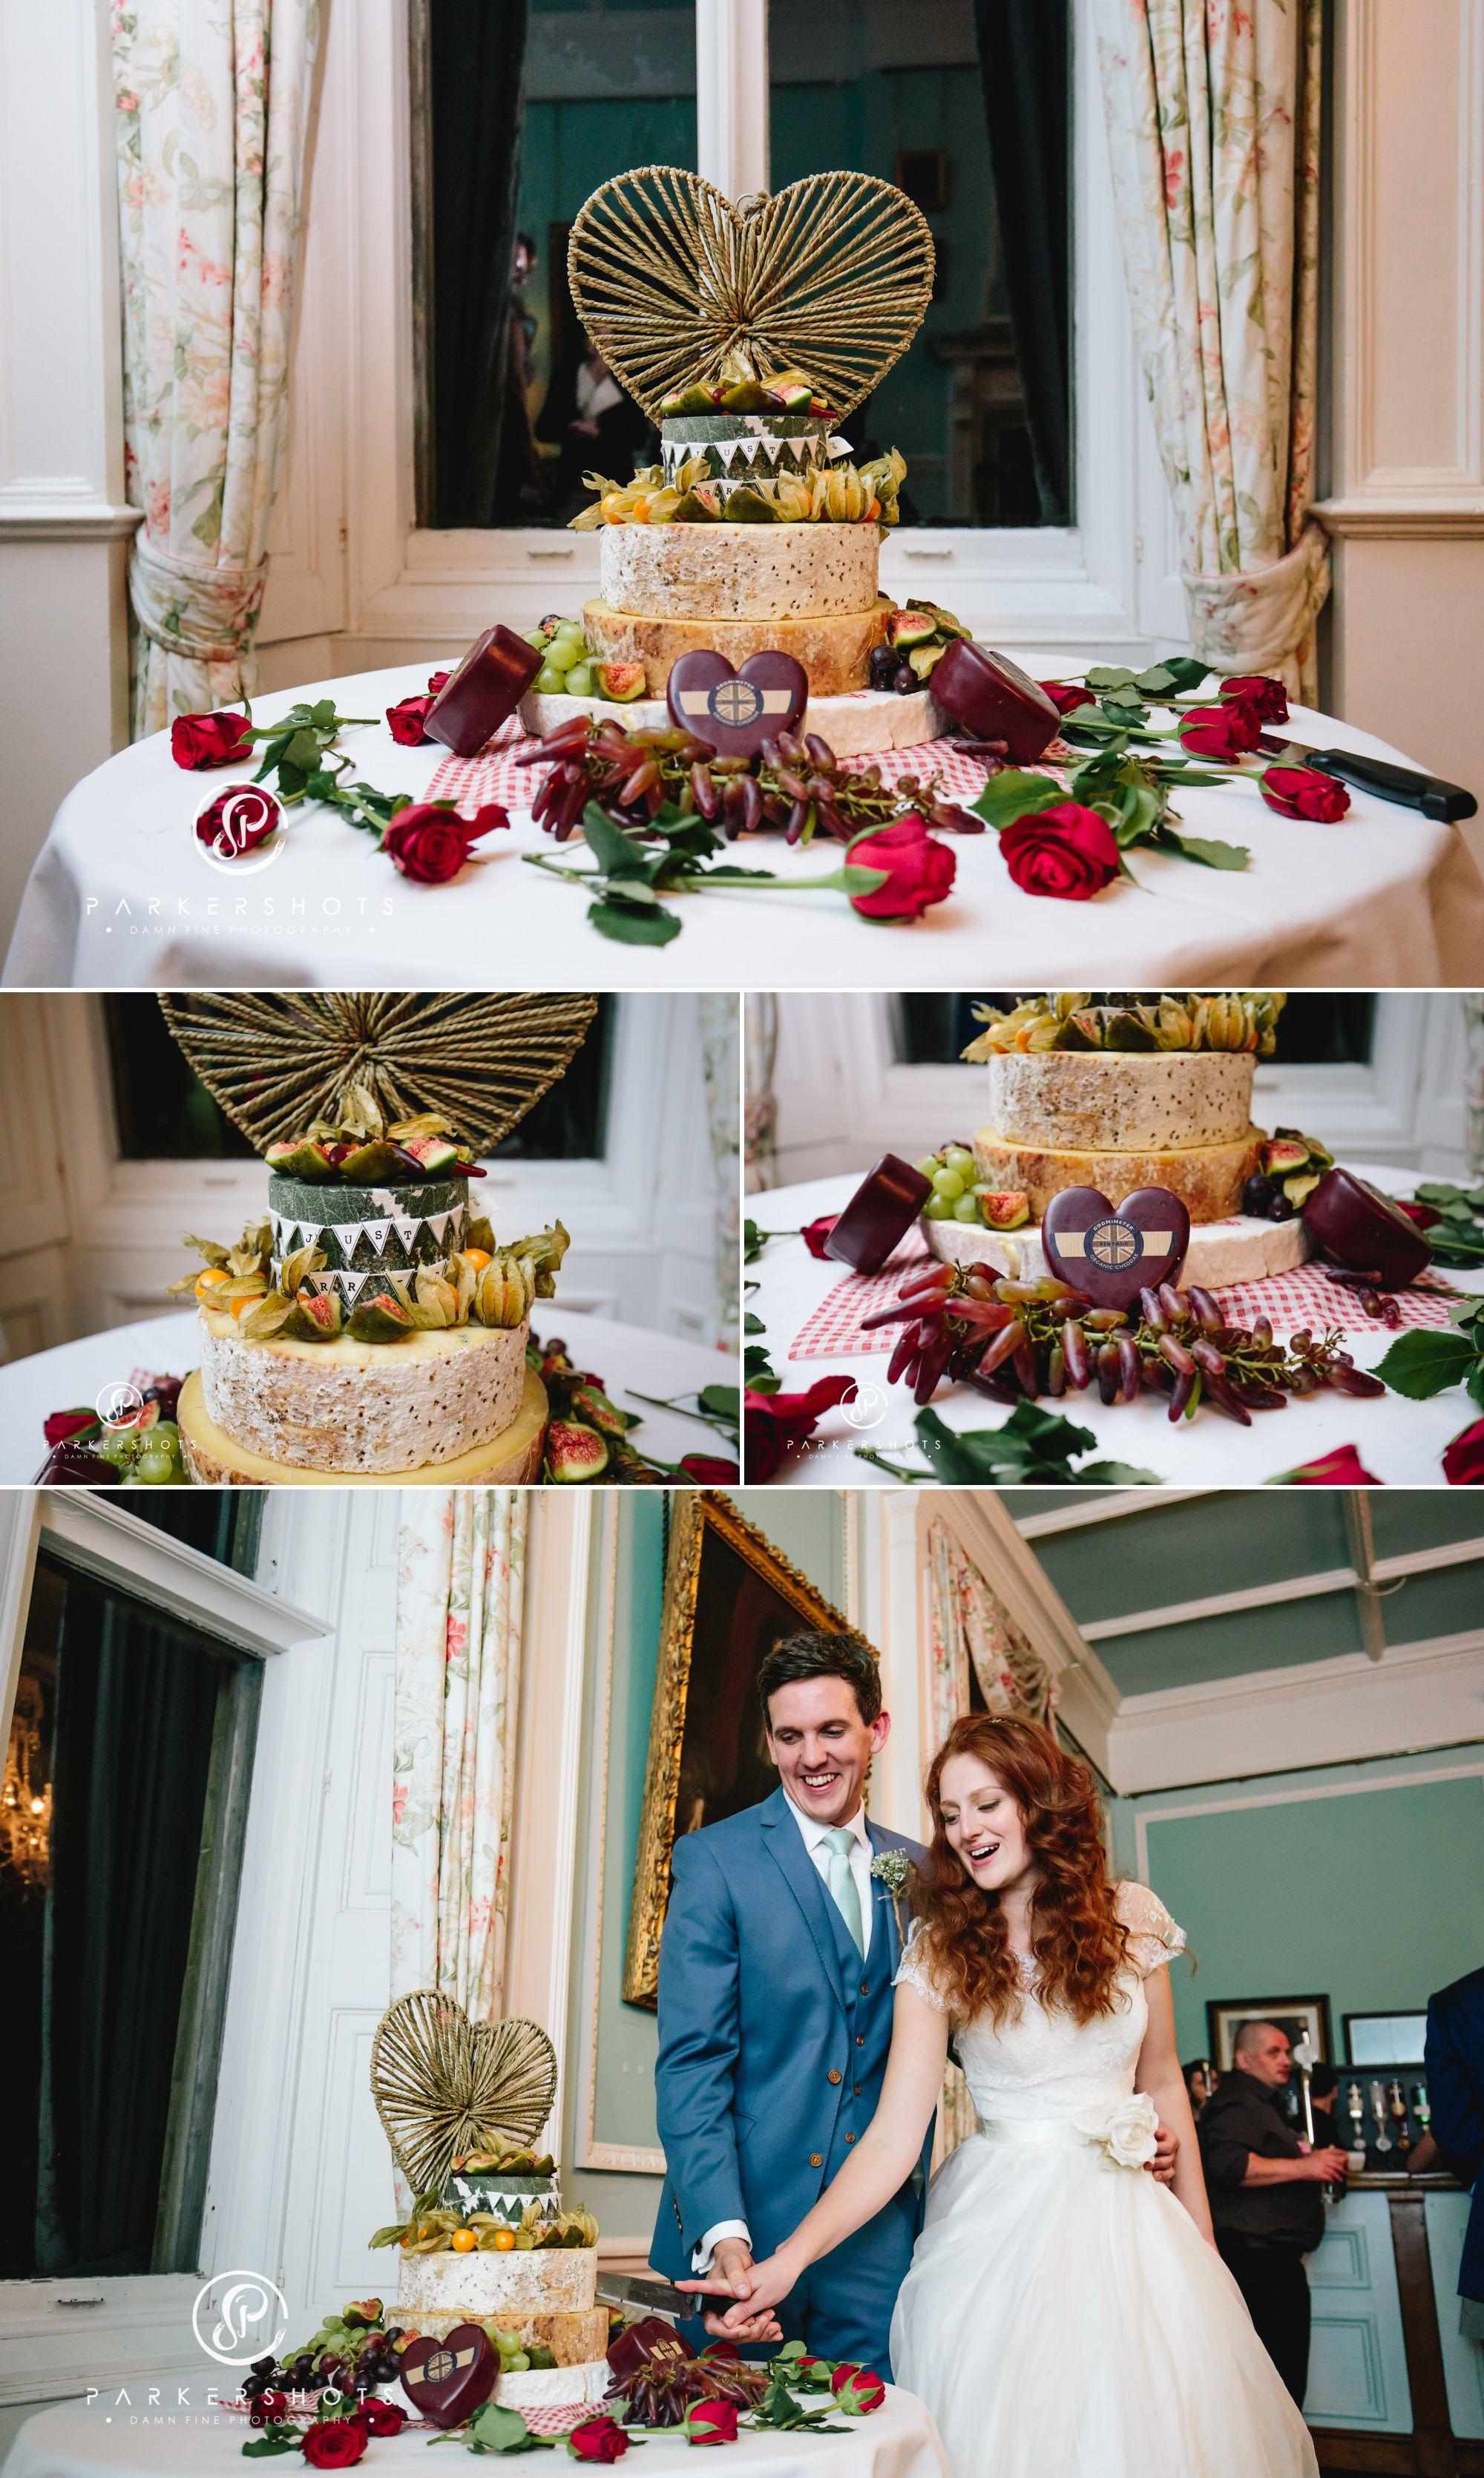 Chiddingstone_Castle_Wedding_Photographer 23